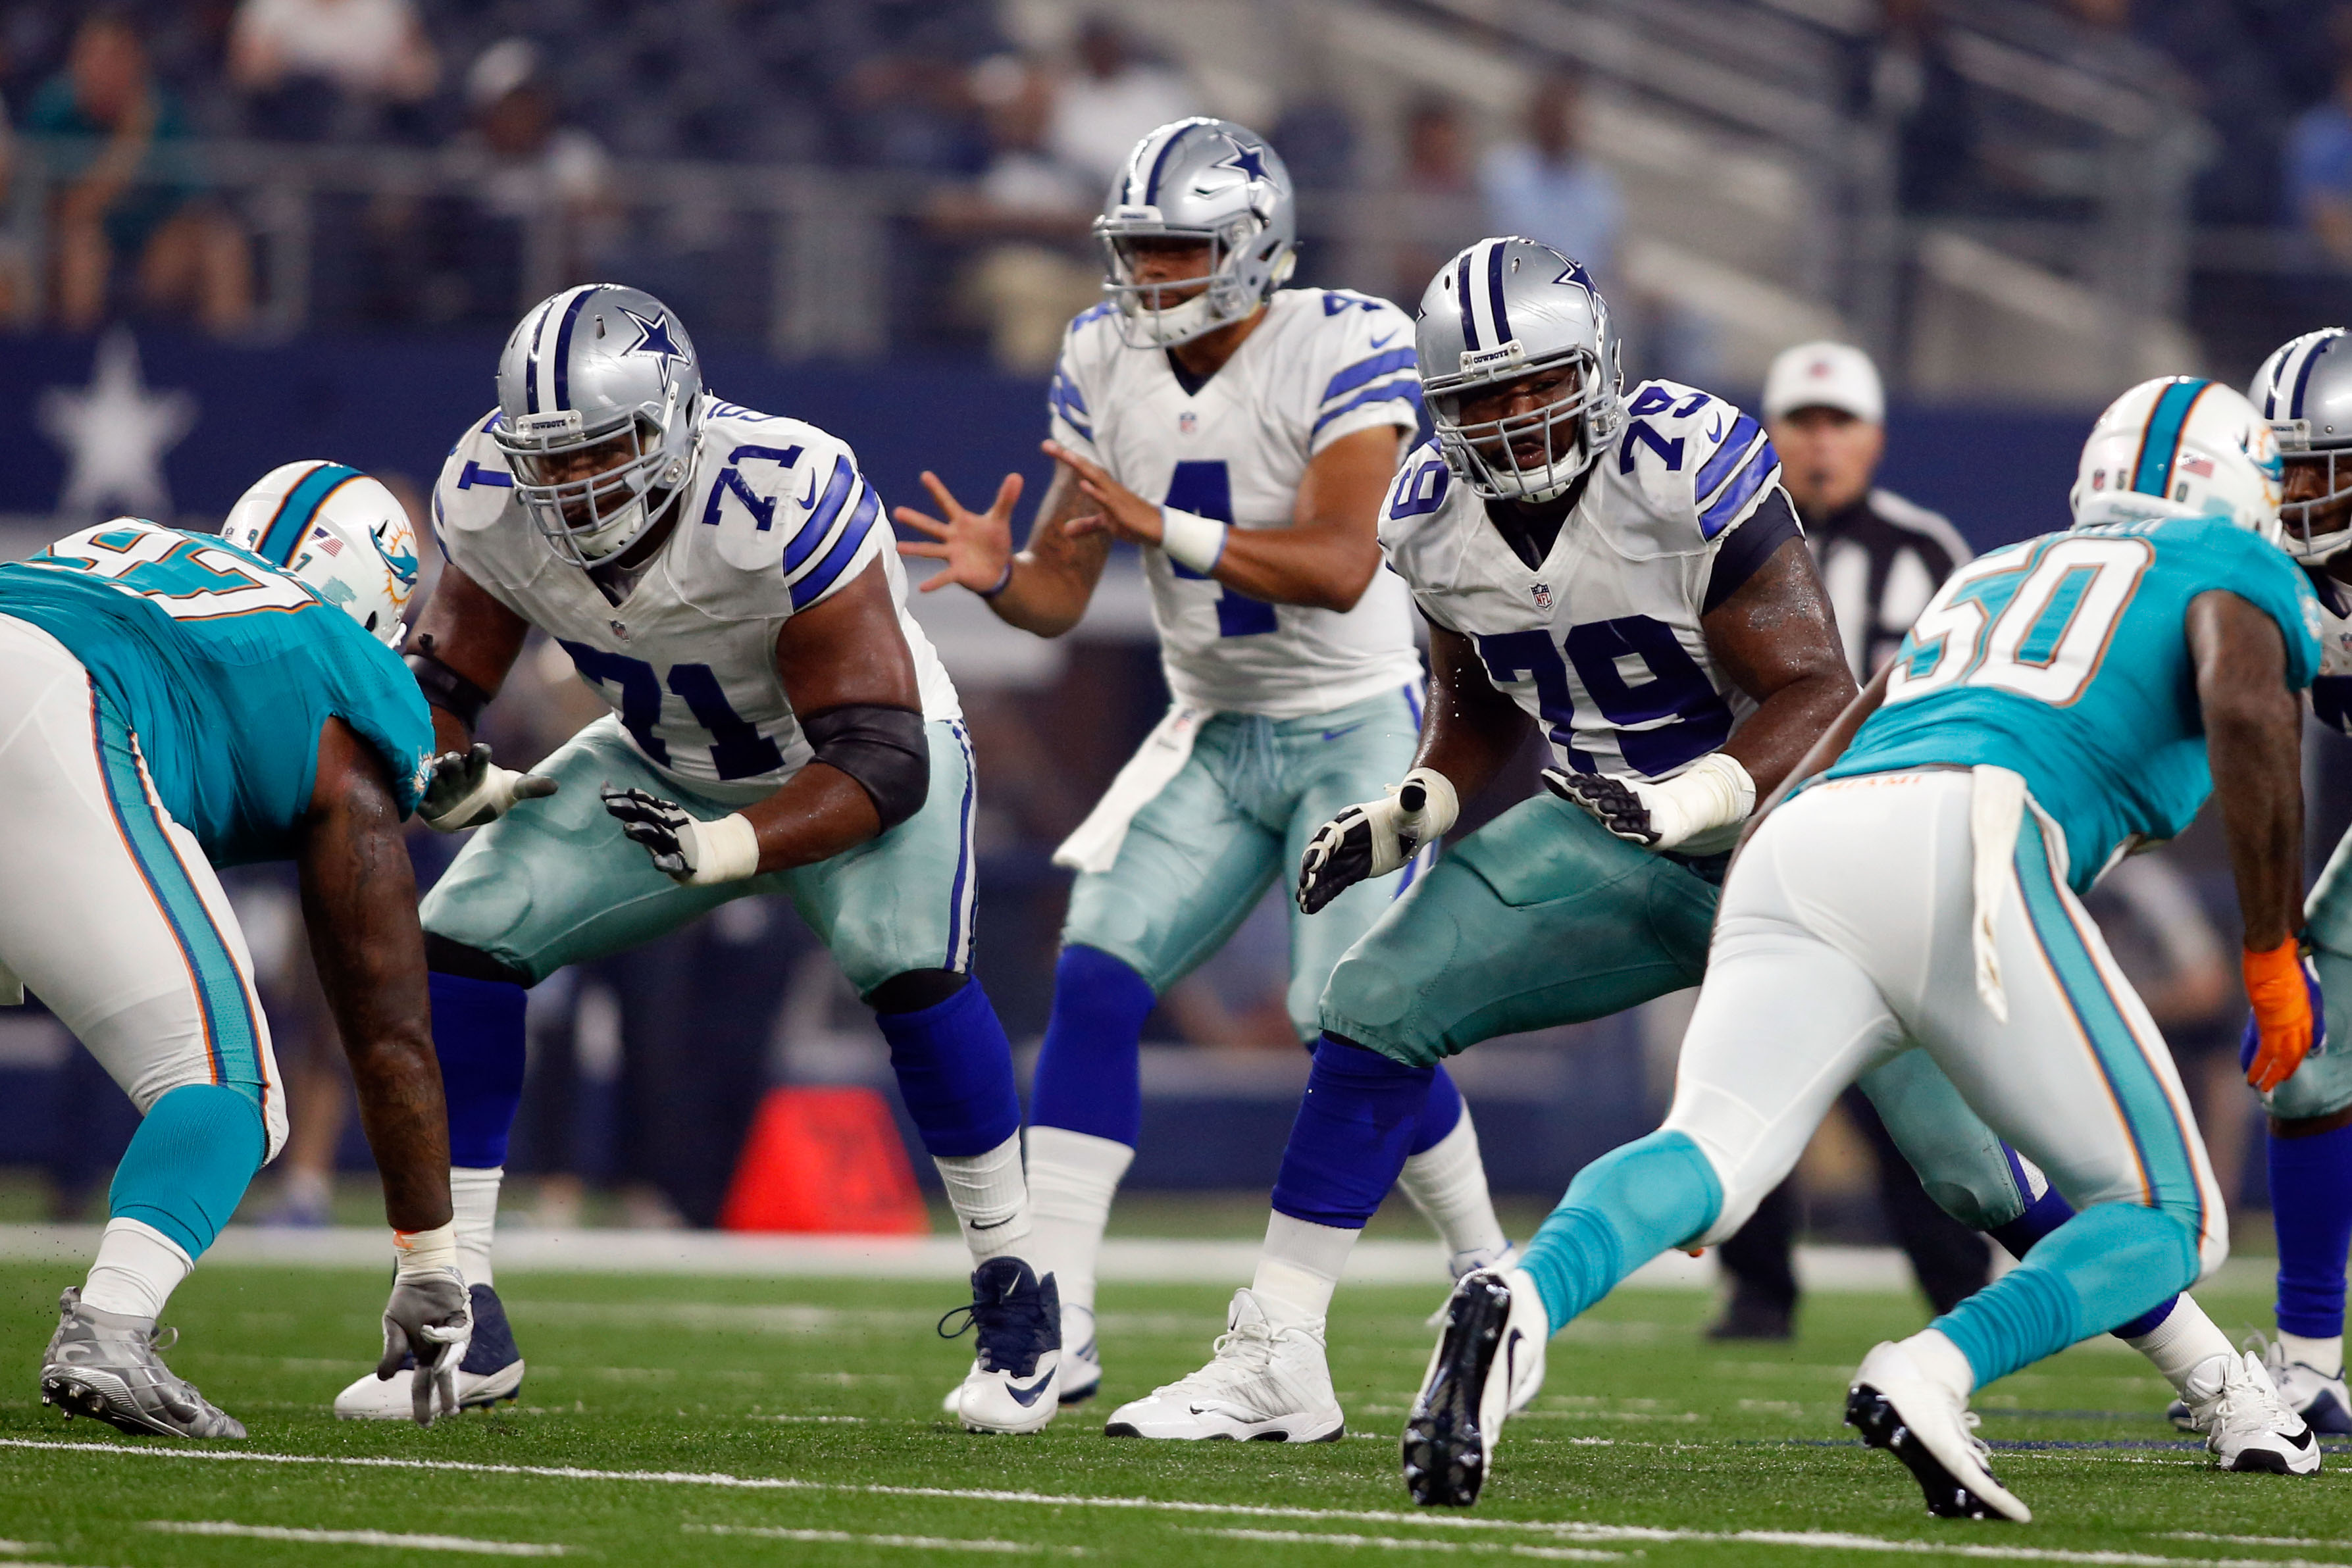 Dallas cowboys la el collins at right tackle the best option for Lael williams